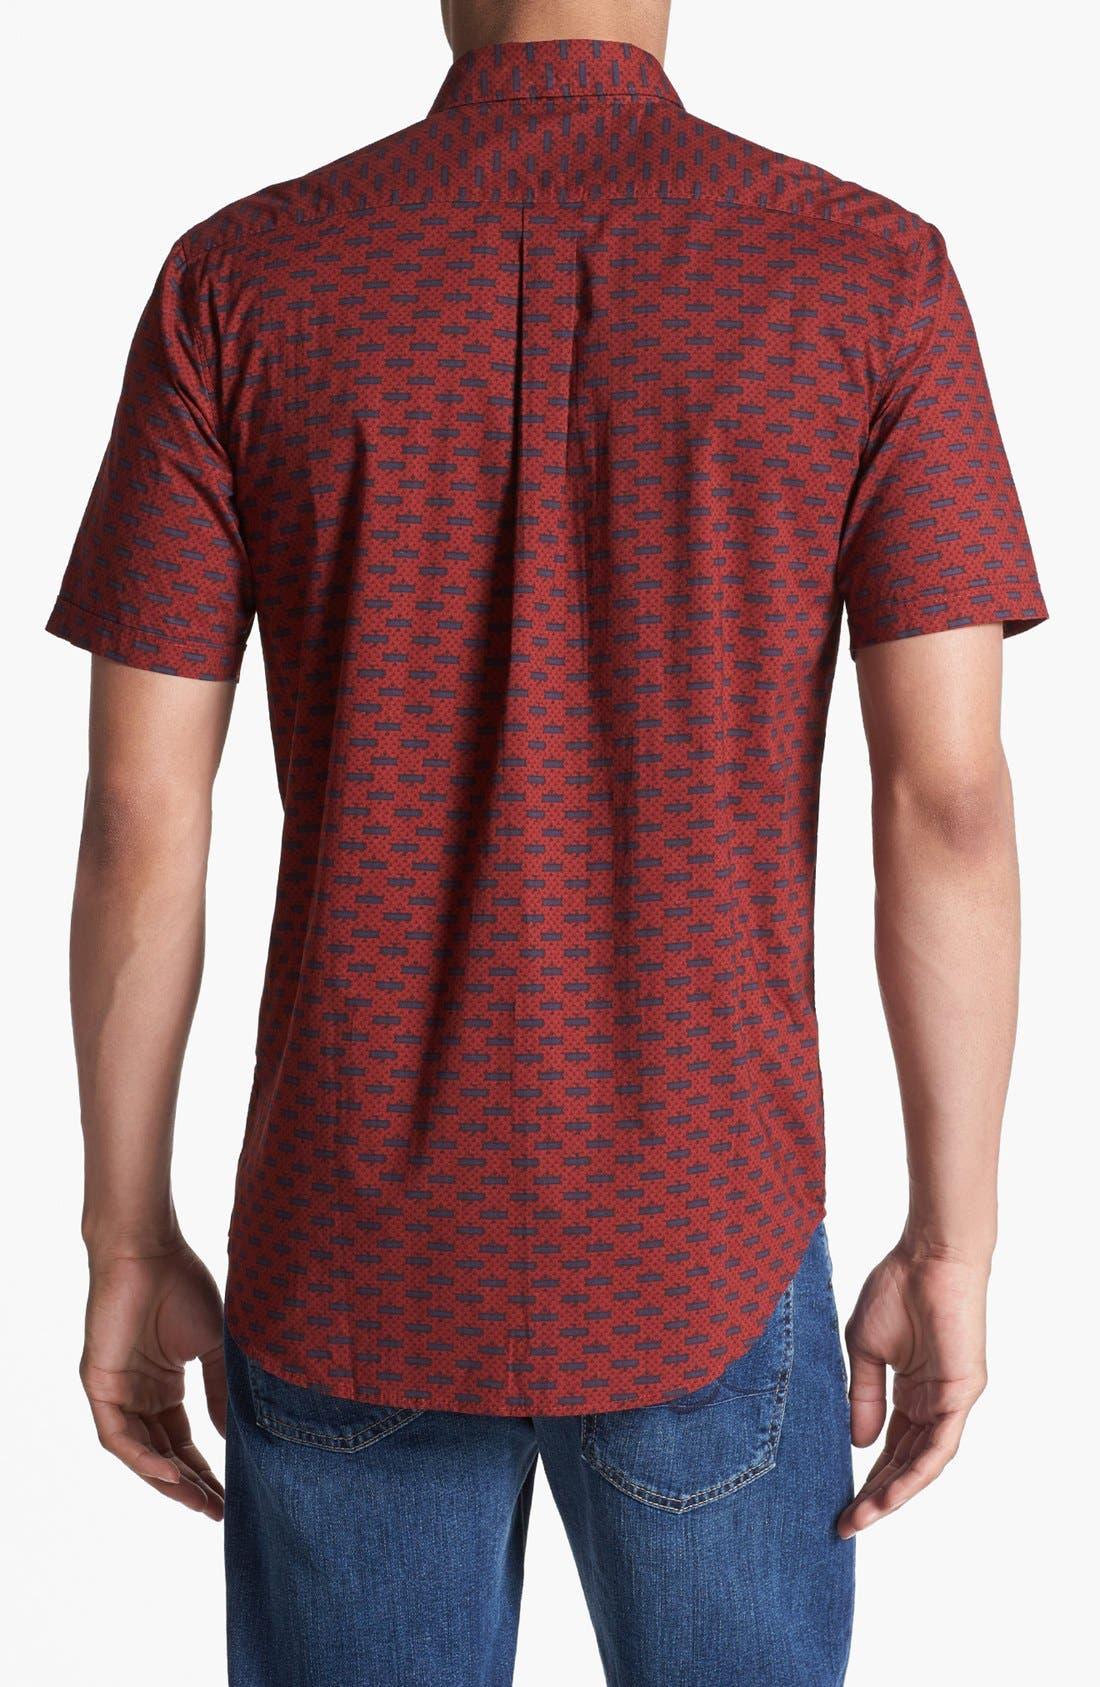 Alternate Image 3  - RVCA 'Chronicles' Print Woven Shirt